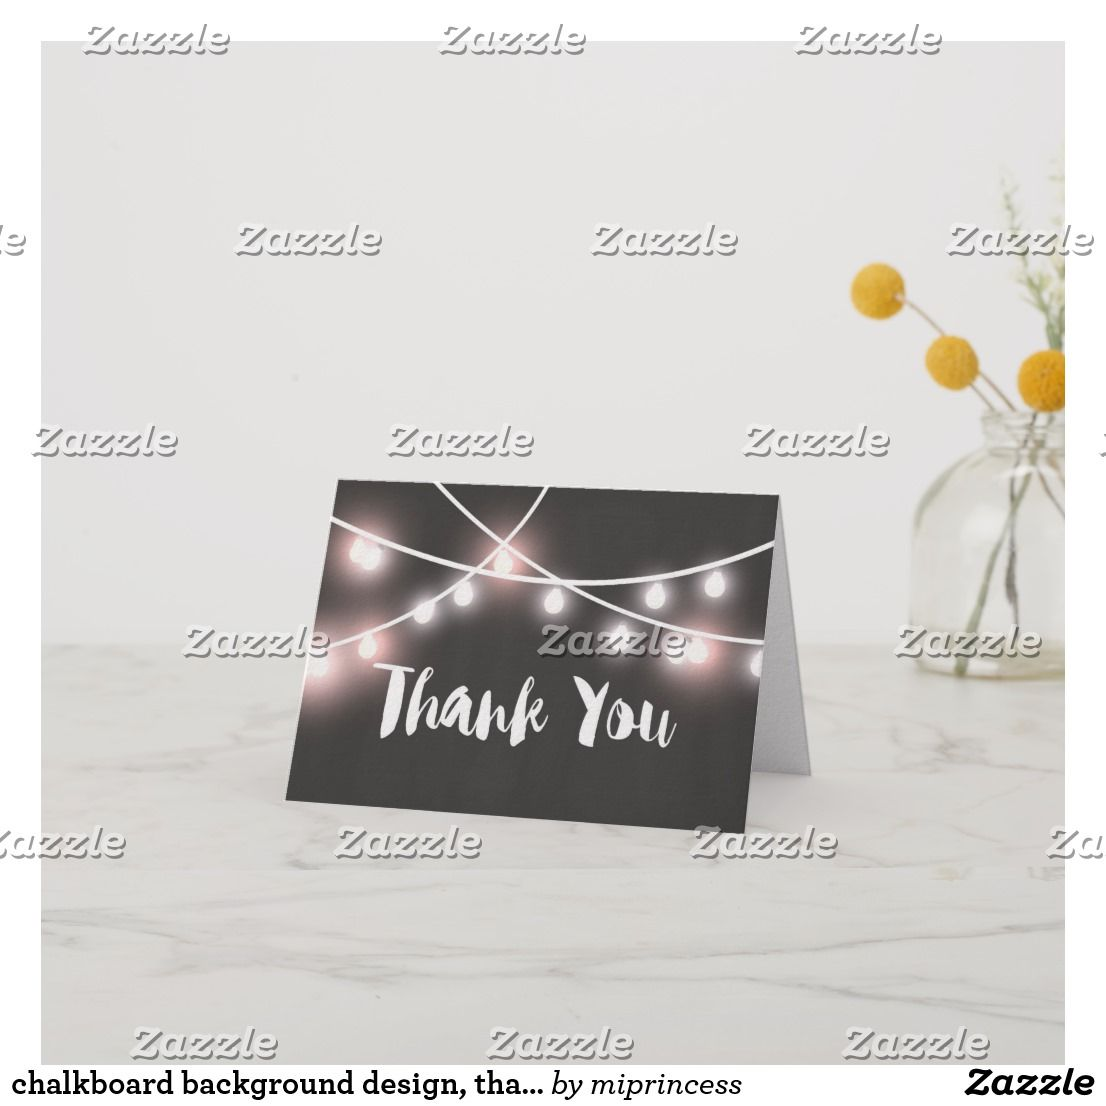 chalkboard background design thank you card  zazzle